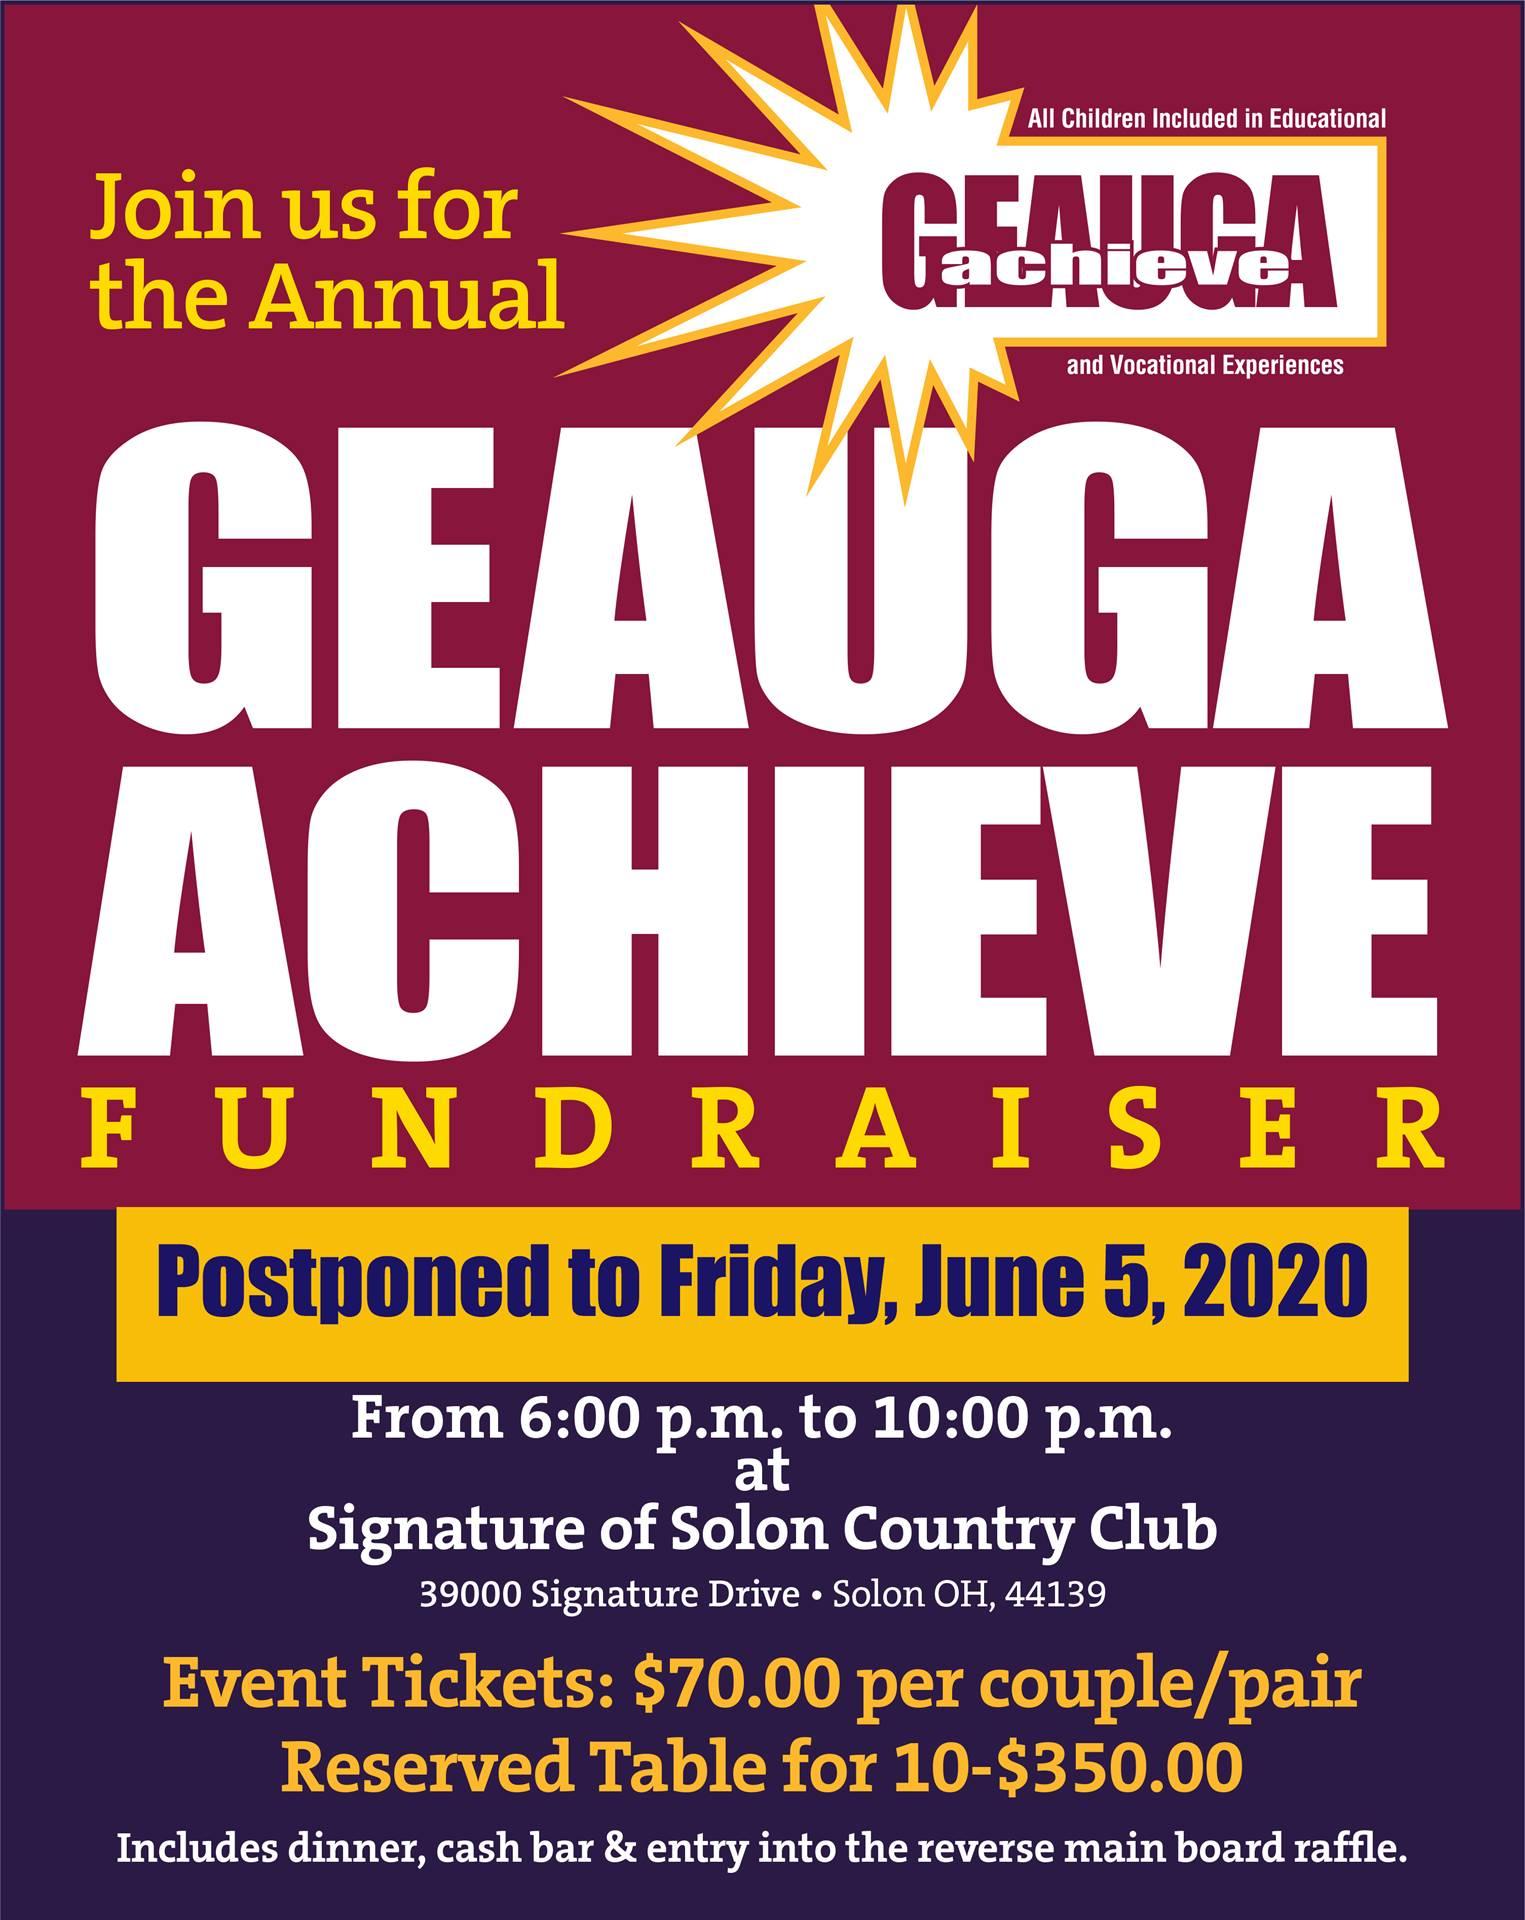 Annual Achieve Fundraiser 2020